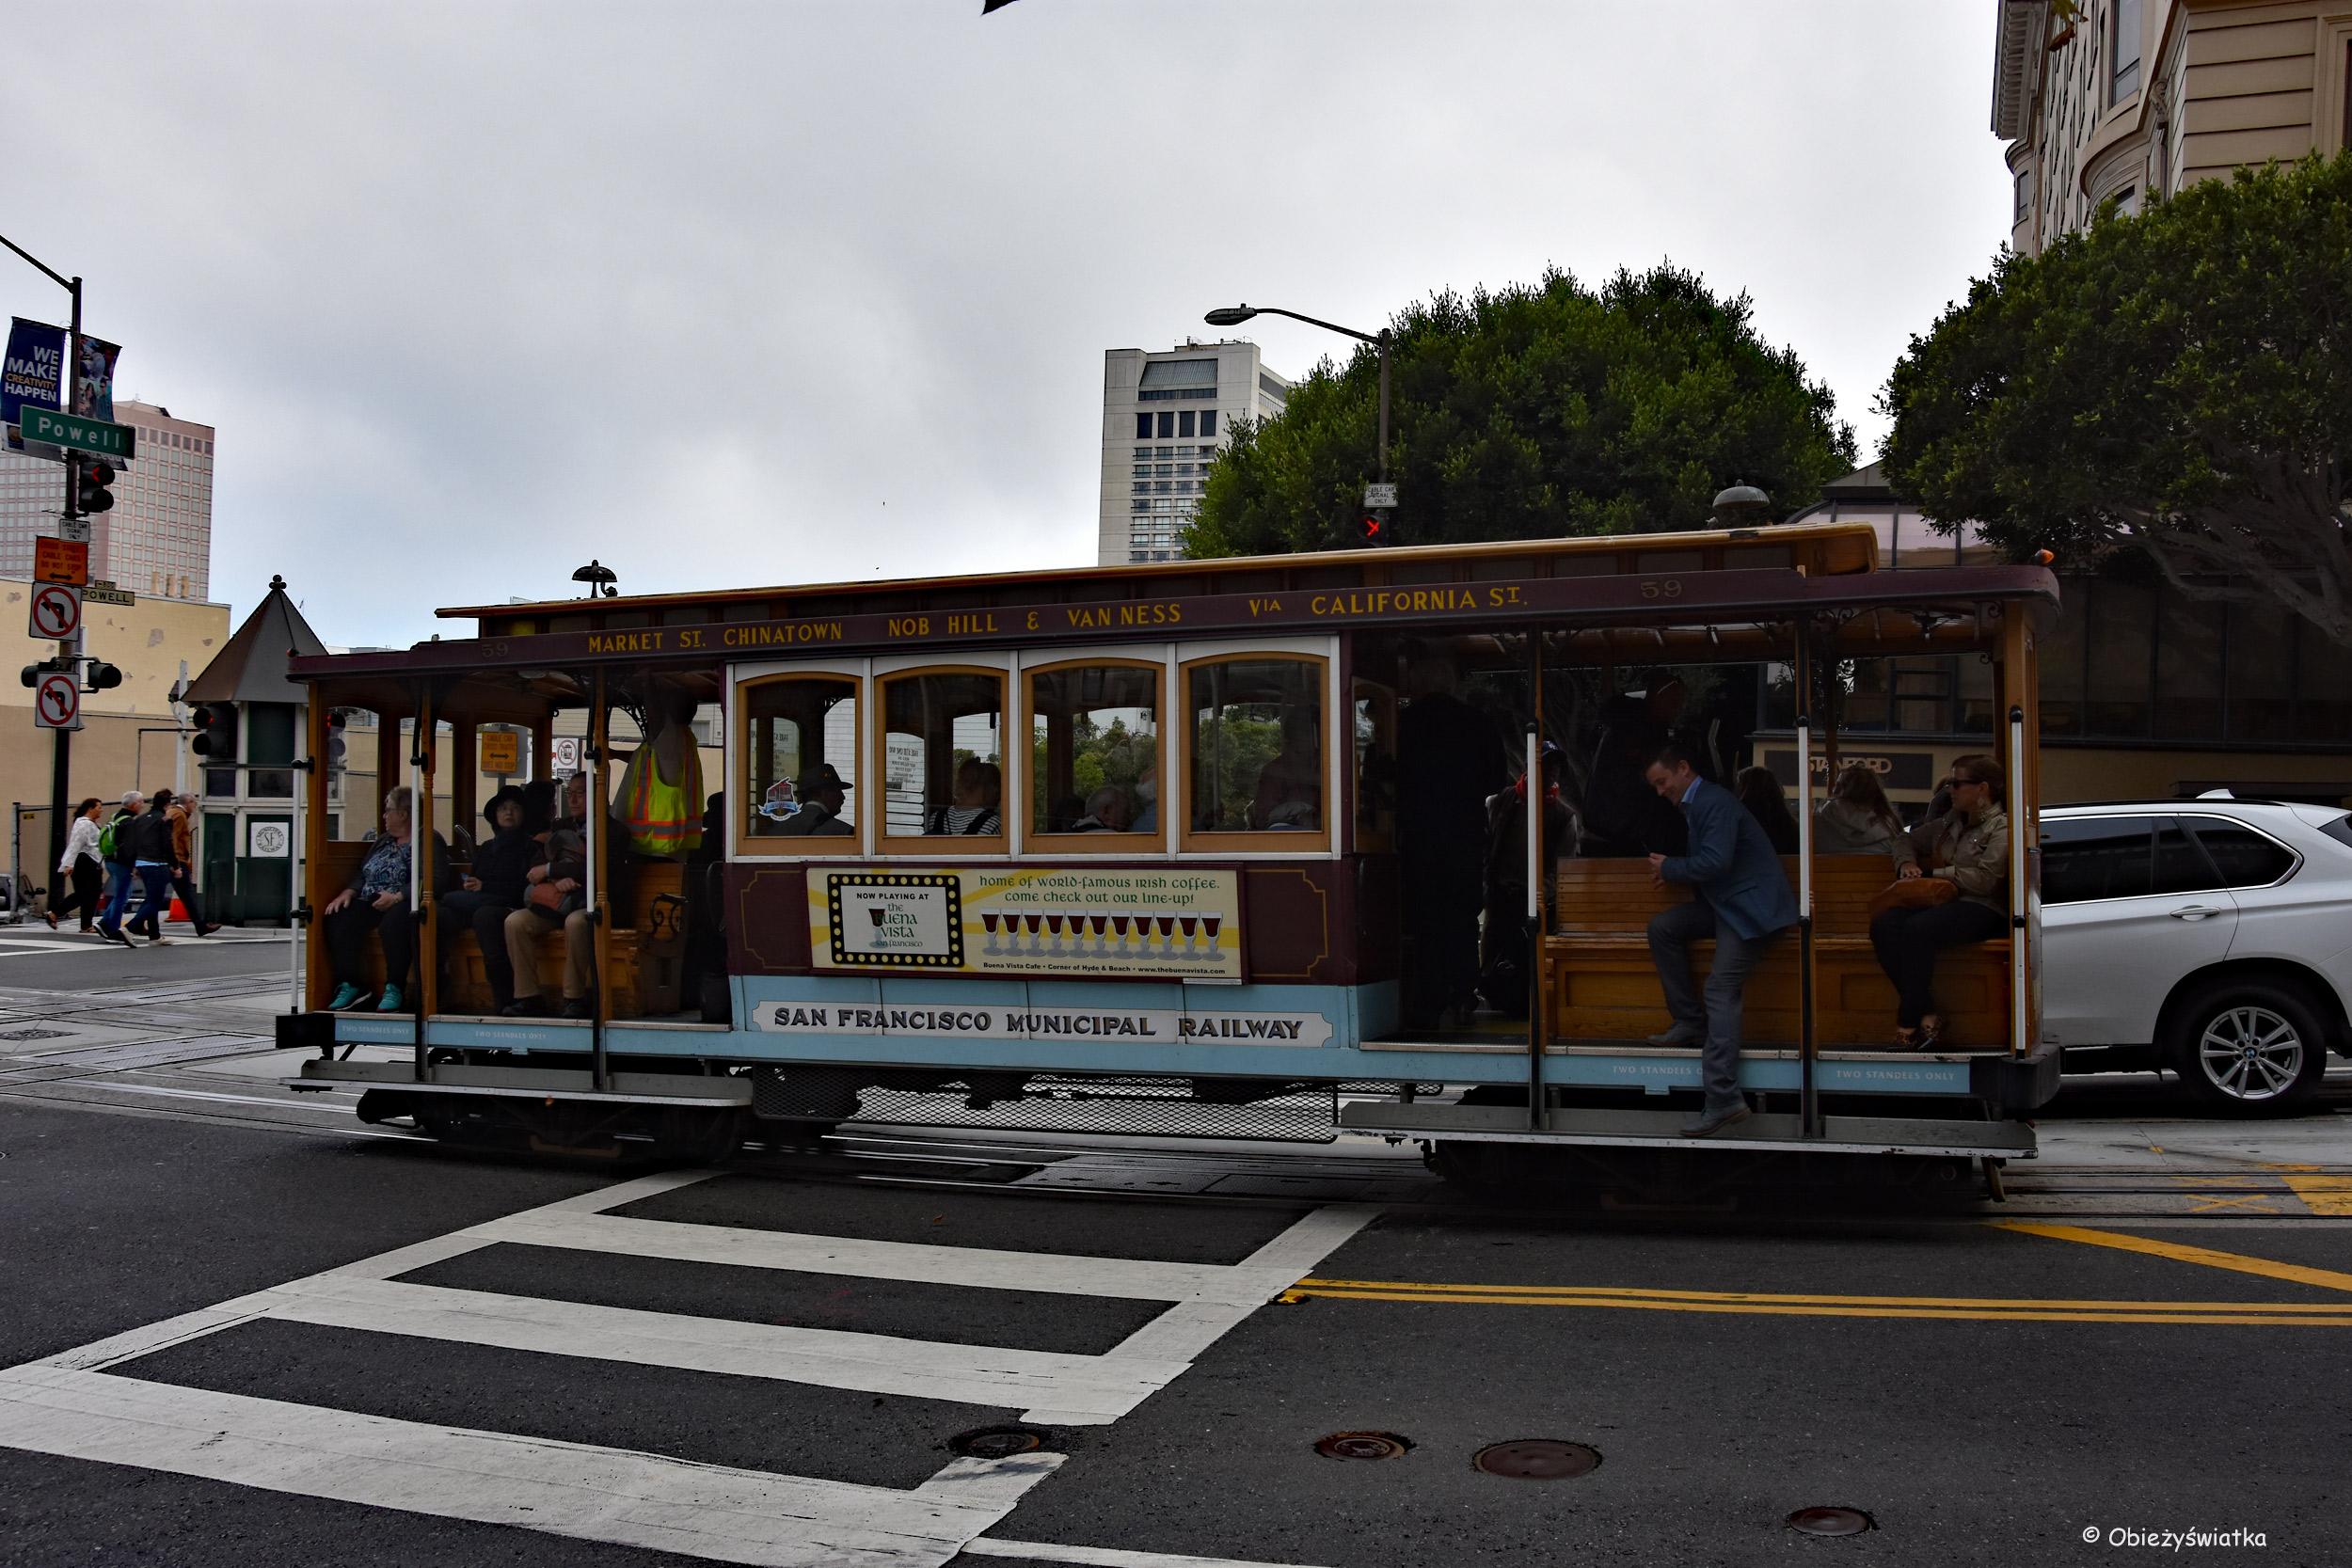 Tamwaj linowy - Cable Car na ulicach San Francisco